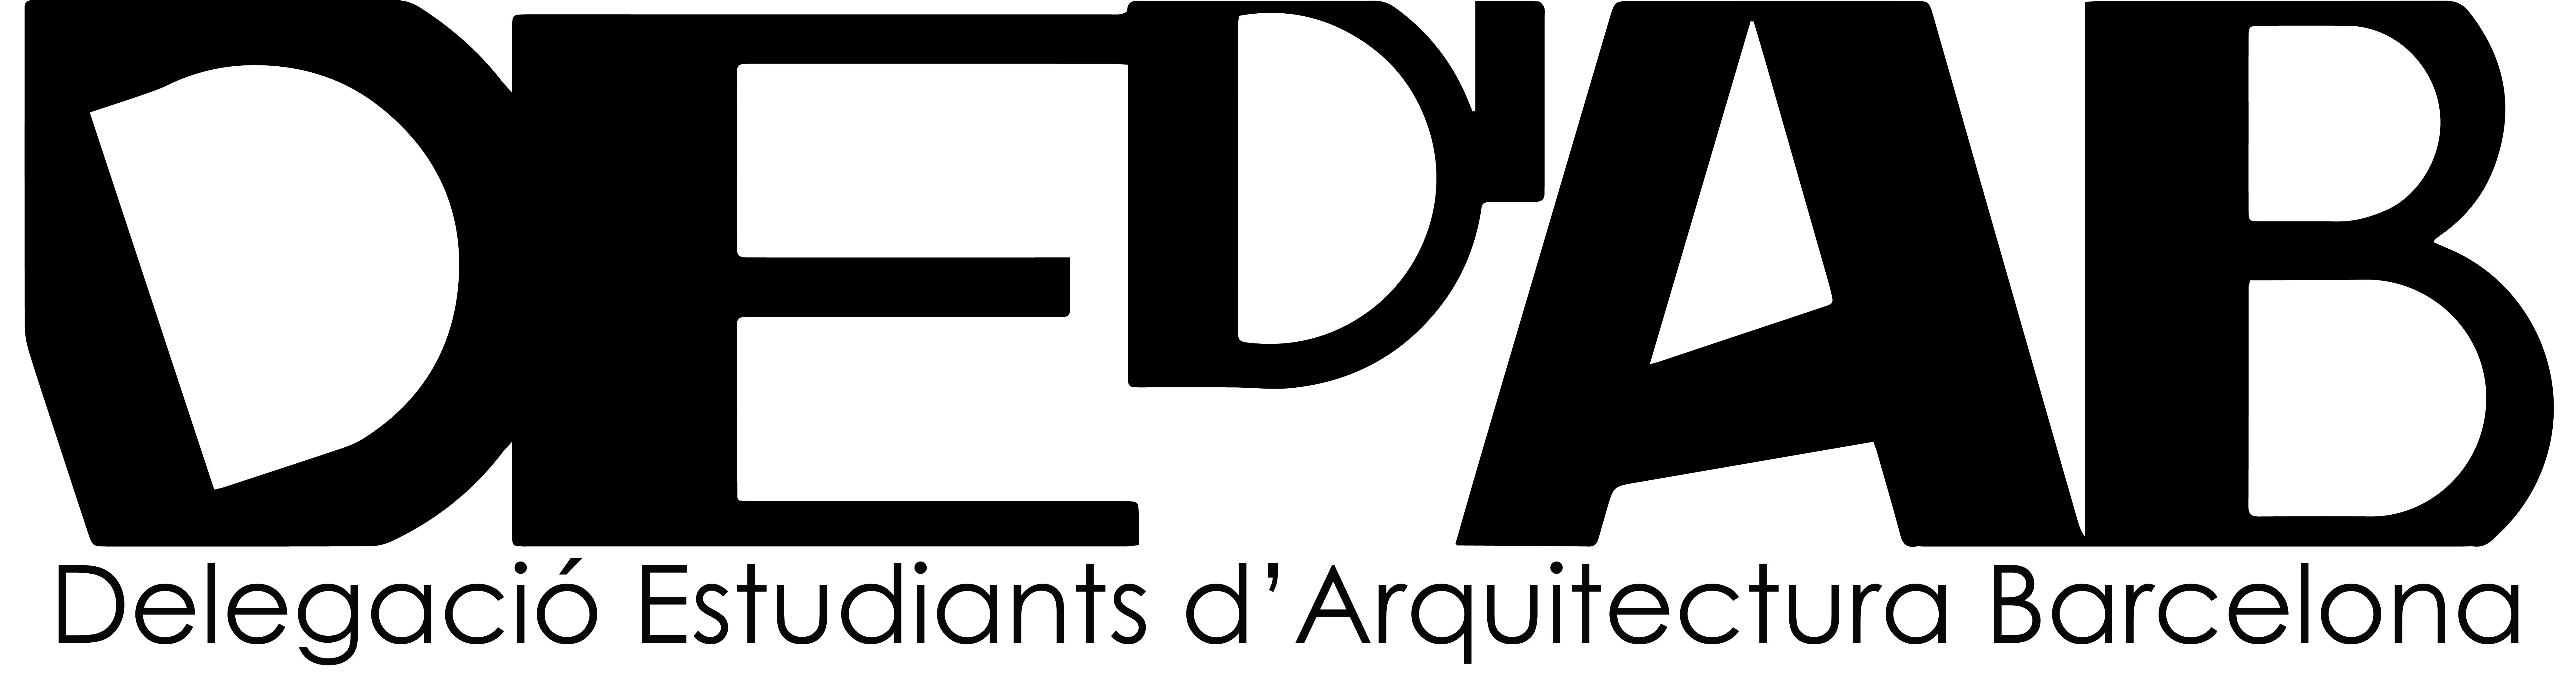 Logo DEd'AB.jpeg